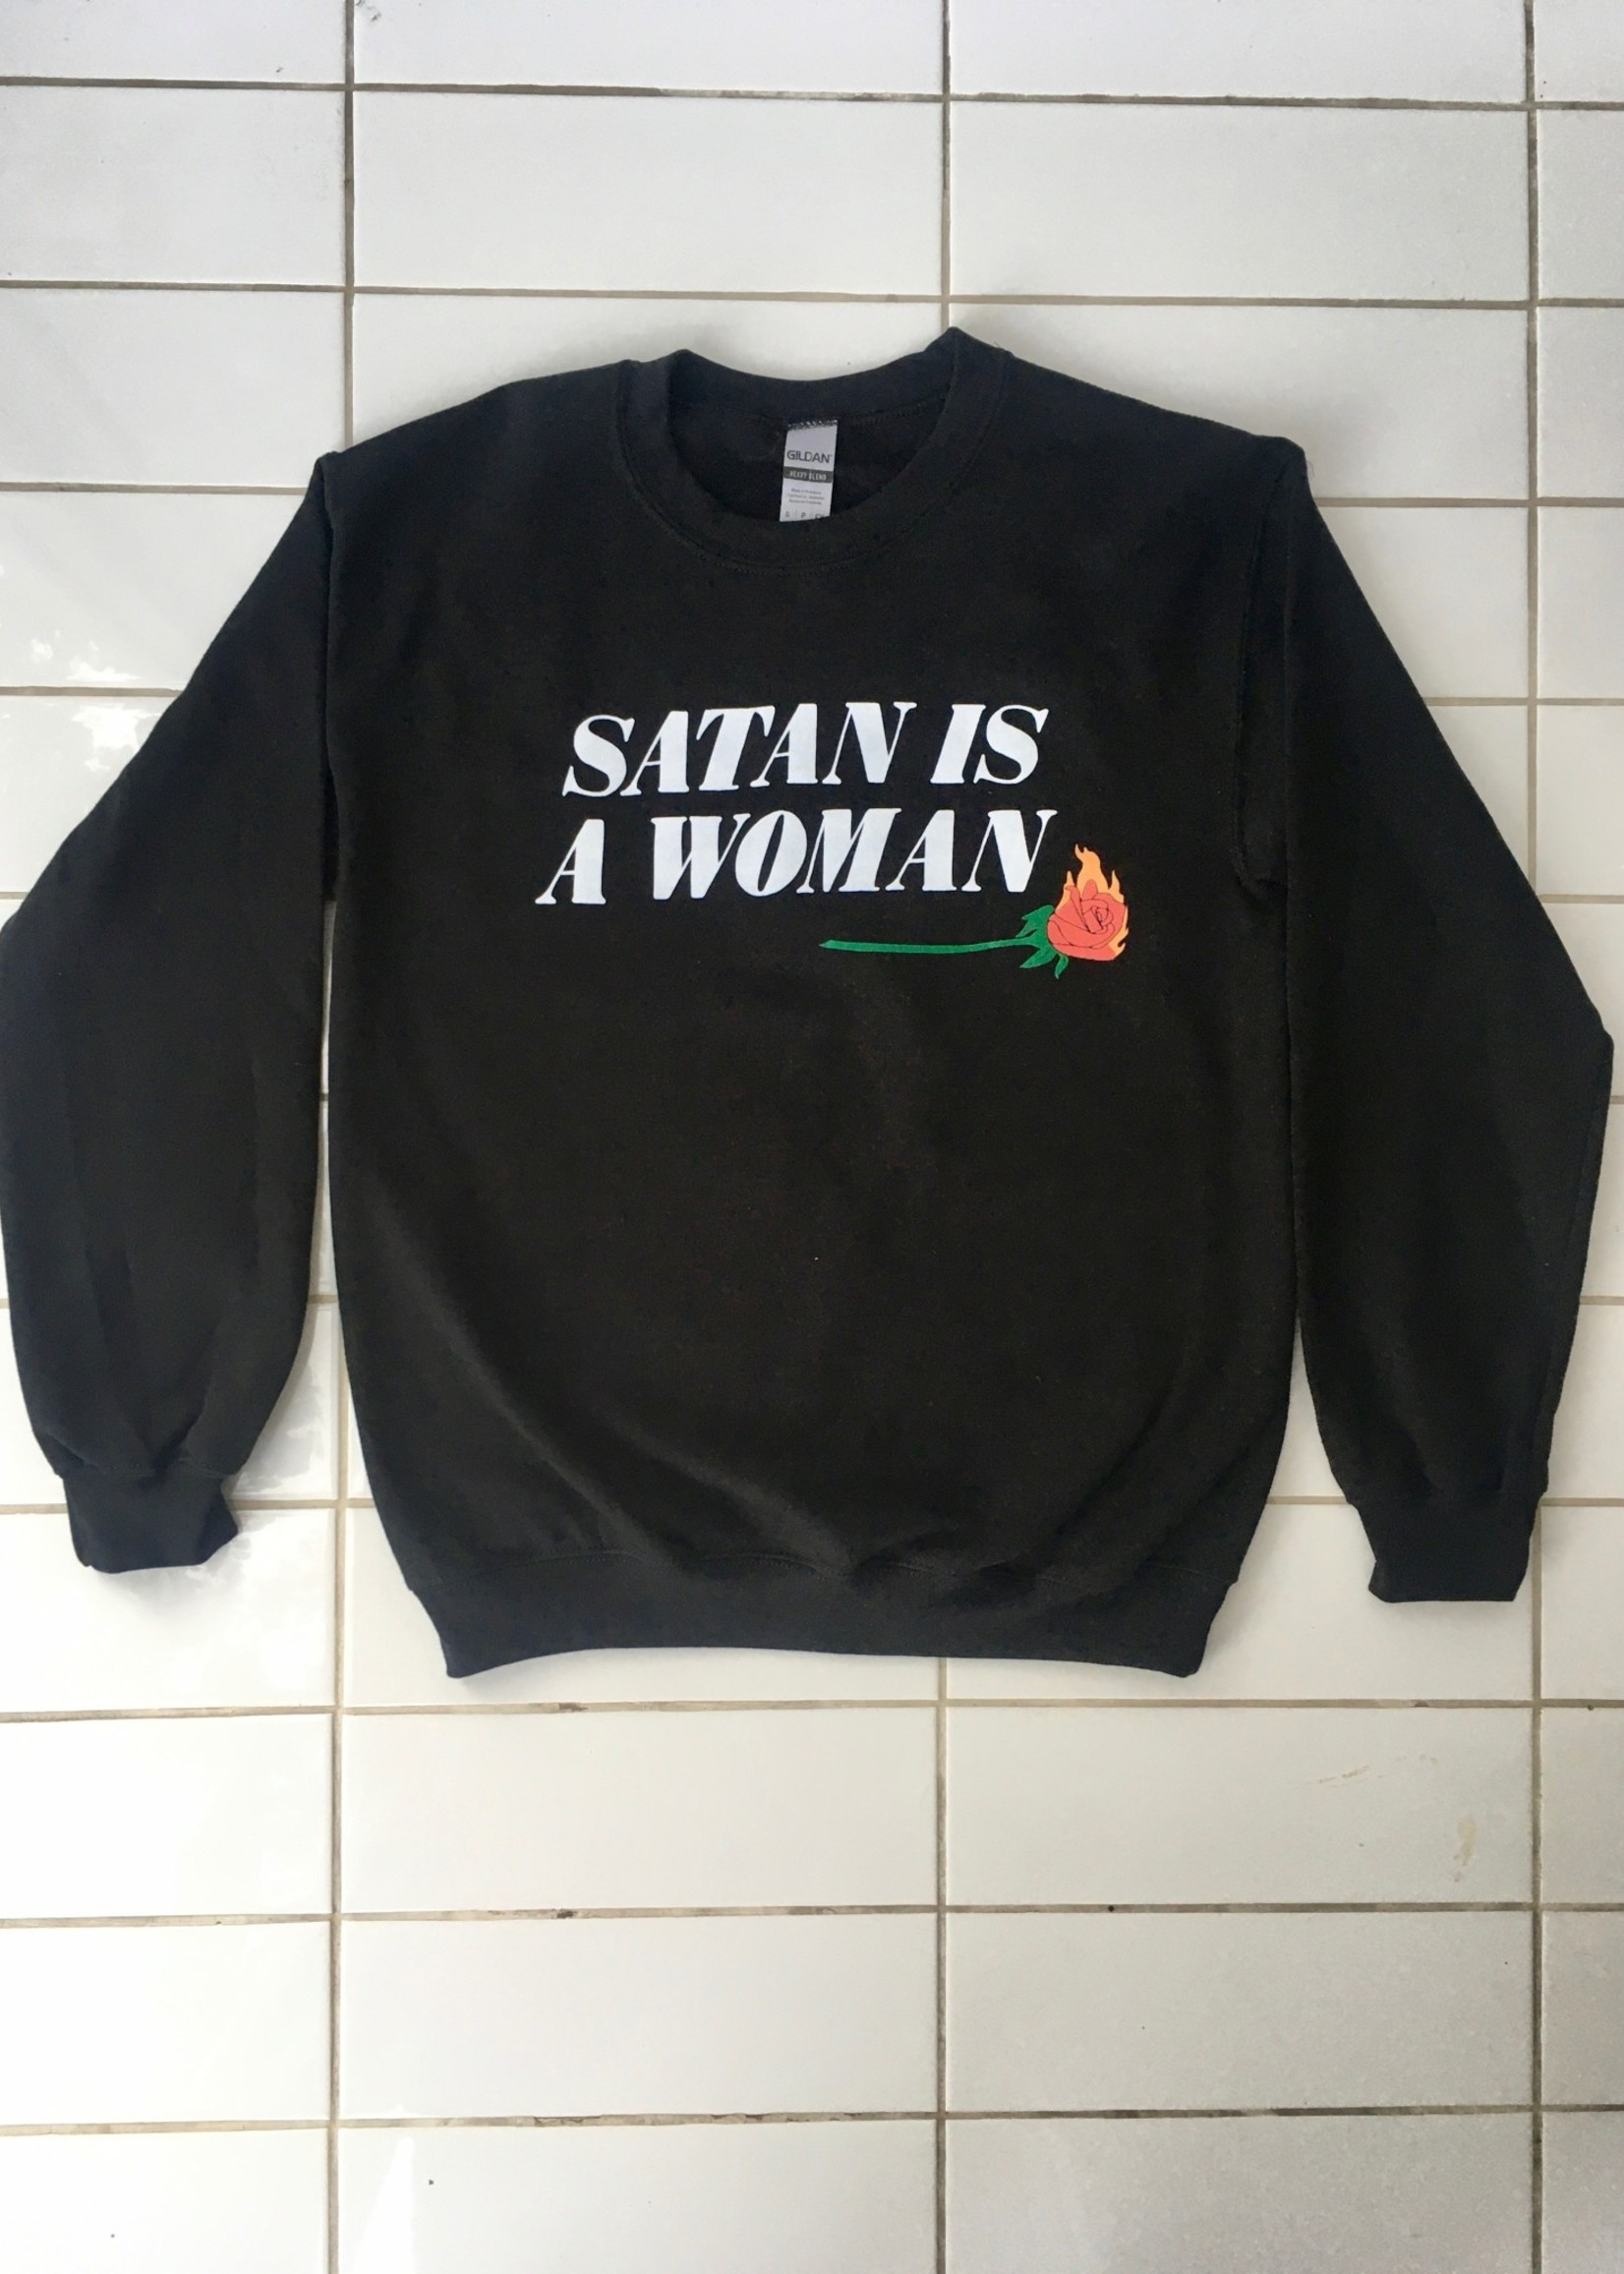 Rosehound Apparel Satan is a woman Sweatshirt